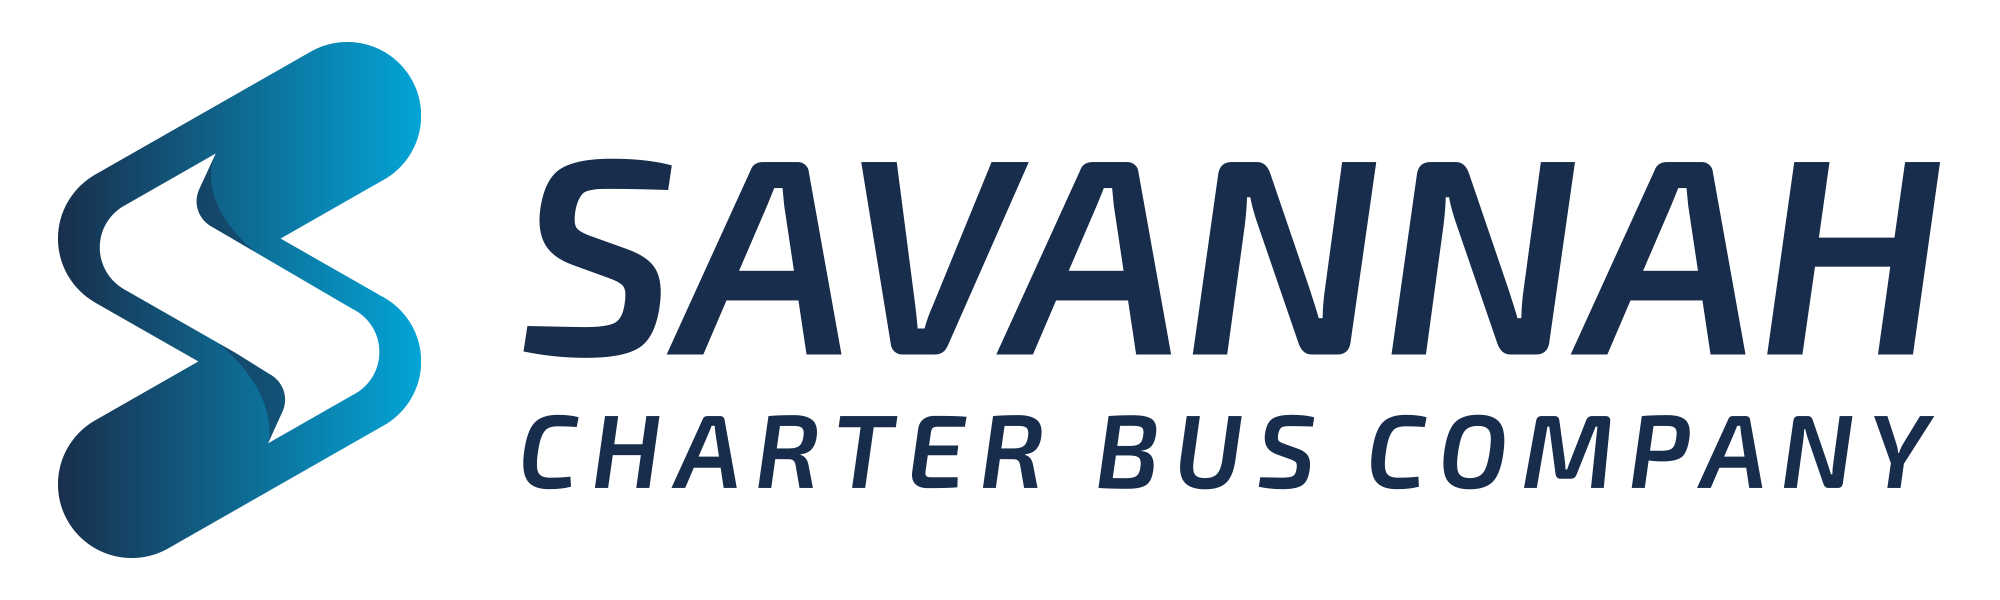 Savannah charter bus